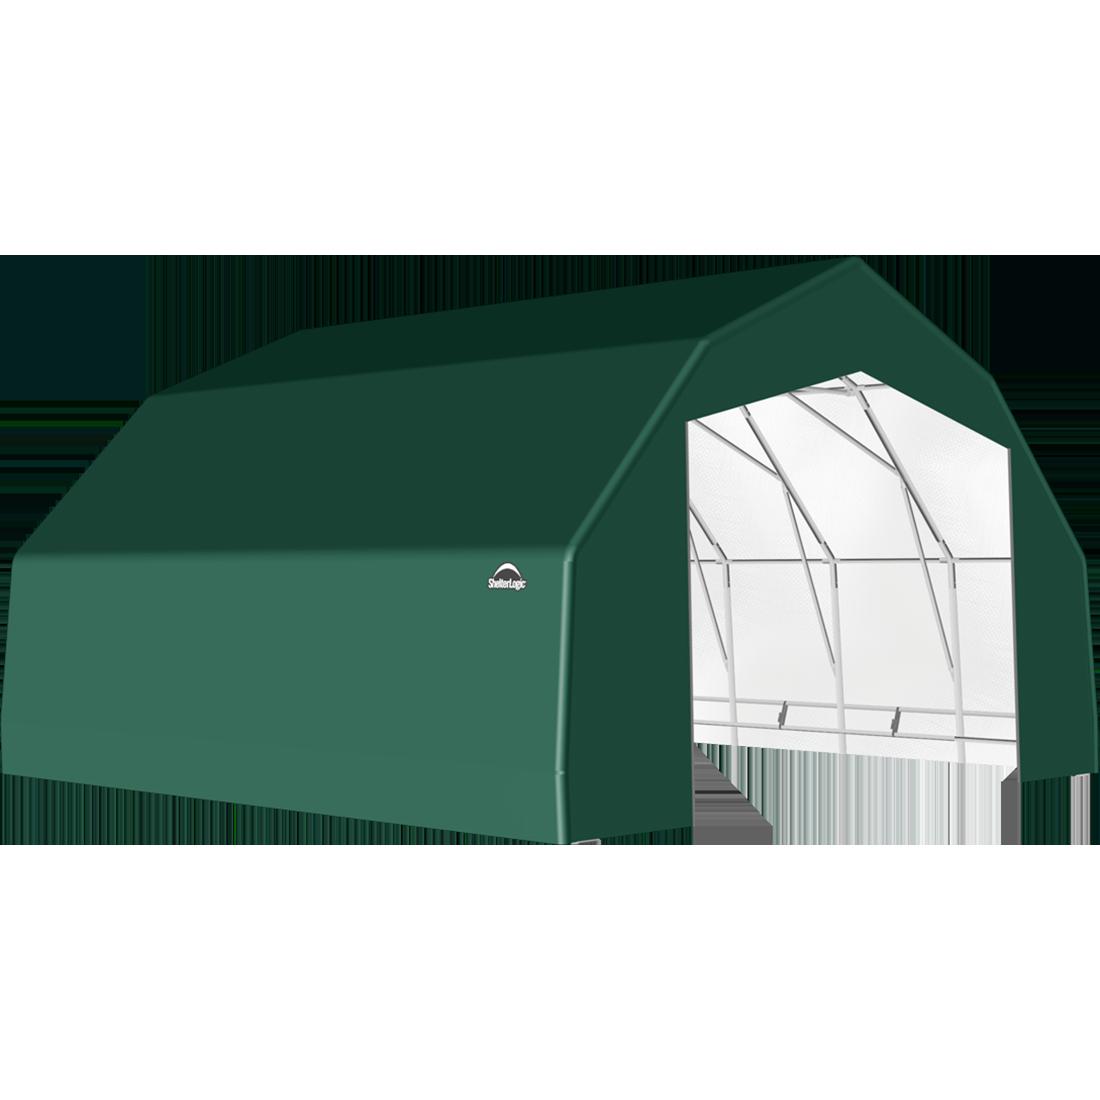 ShelterTech SP Series Barn Shelter, 25 ft. x 24 ft. x 14 ft. Heavy Duty PVC 14.5 oz. Green